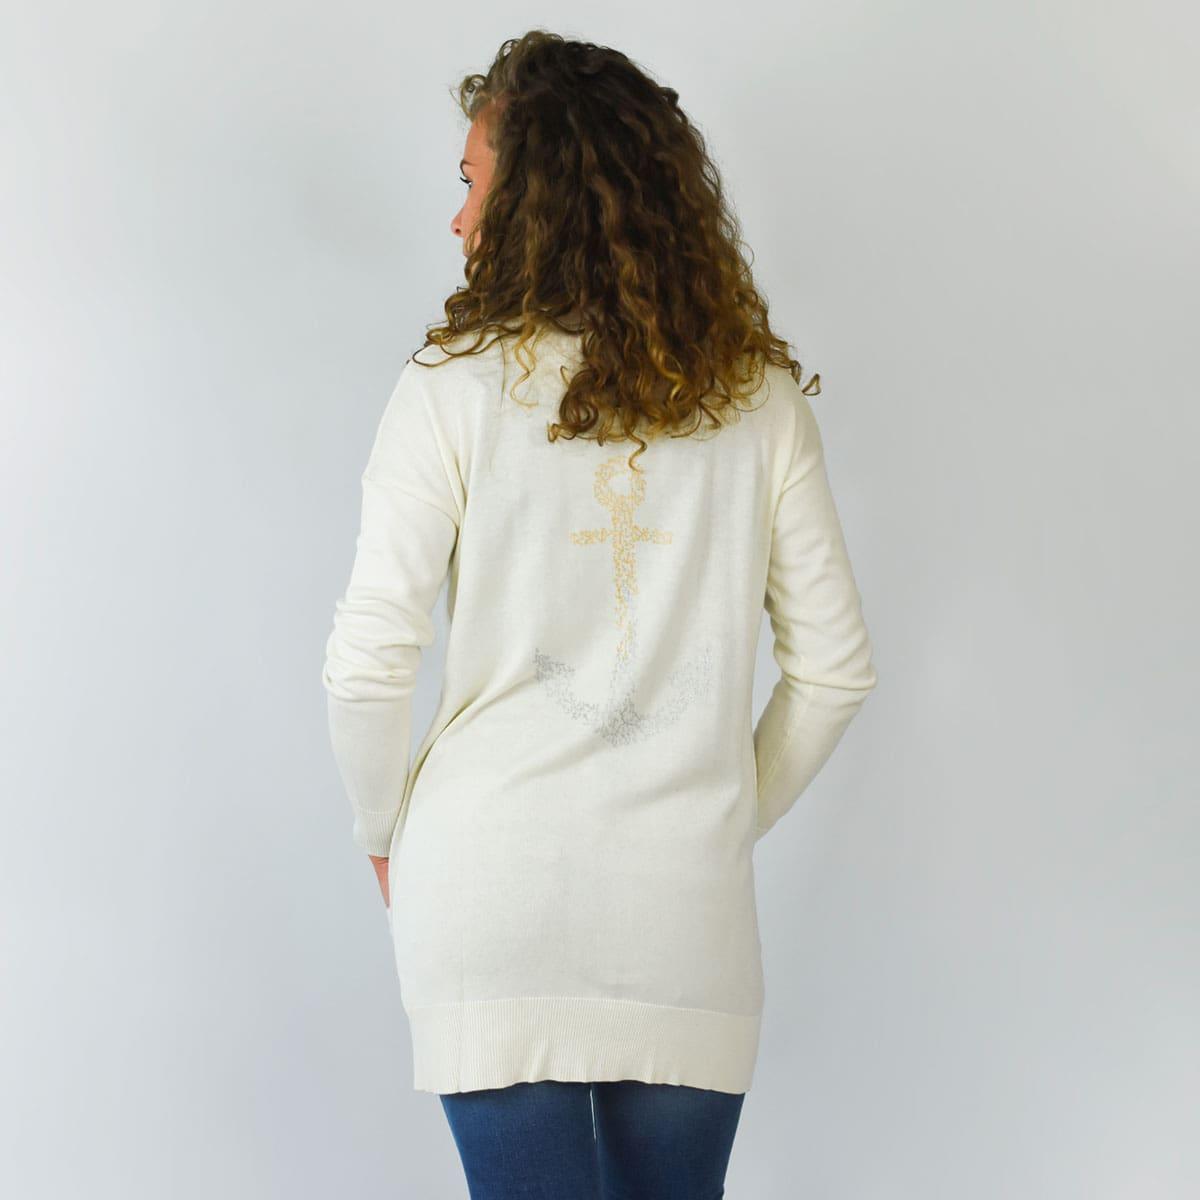 Gilet marin Binic blanc avec ancre au dos